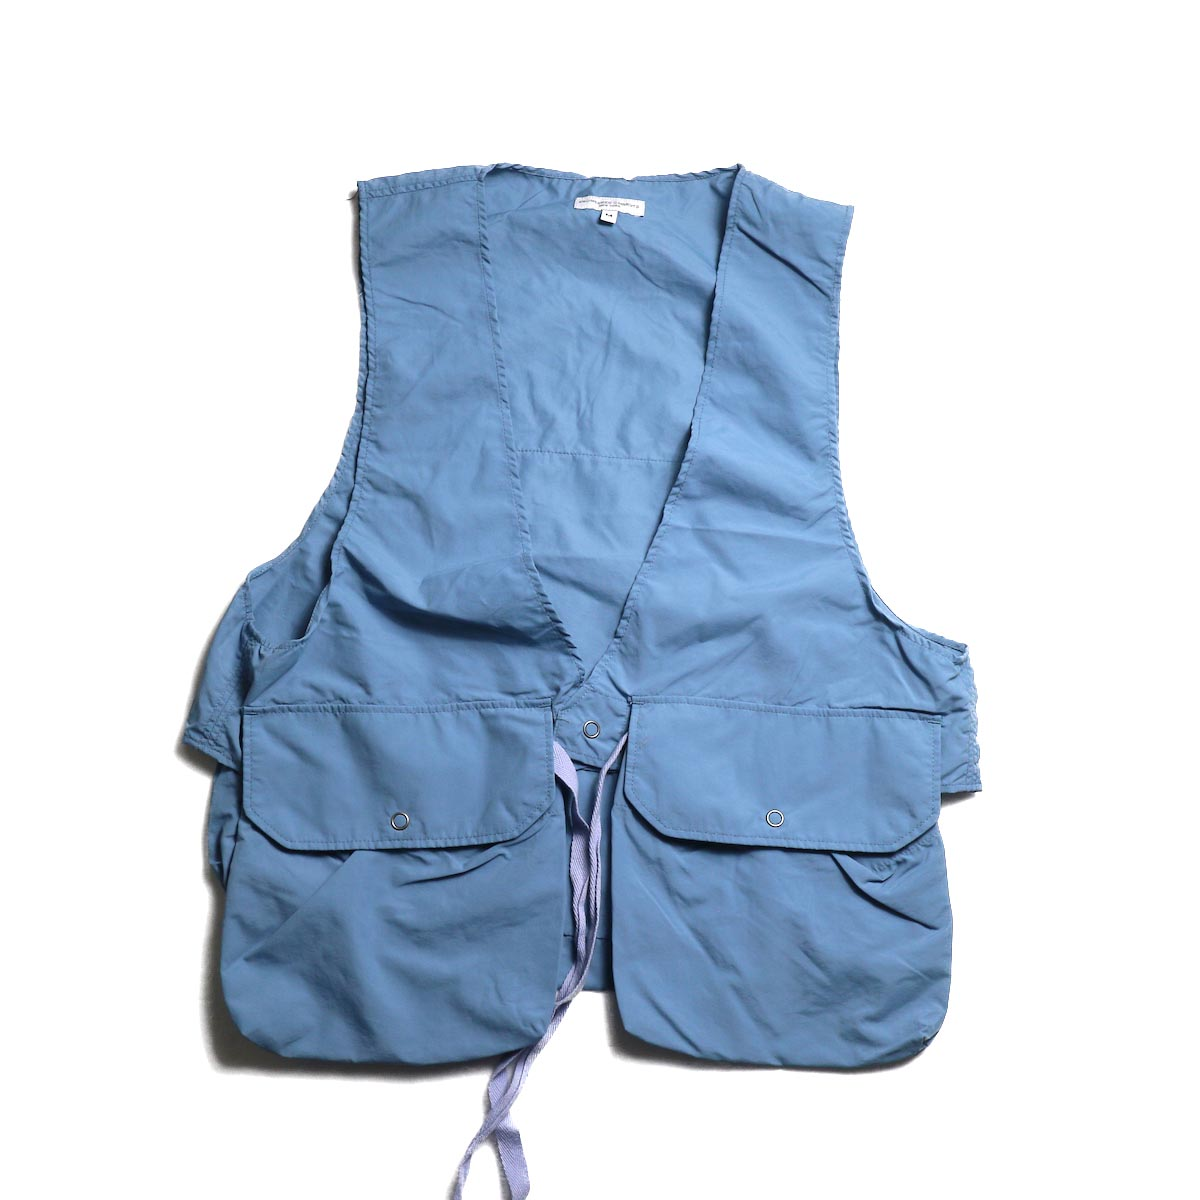 ENGINEERED GARMENTS / Fowl Vest -Acrylic Coated Nylon Taffeta (Lt.Blue)